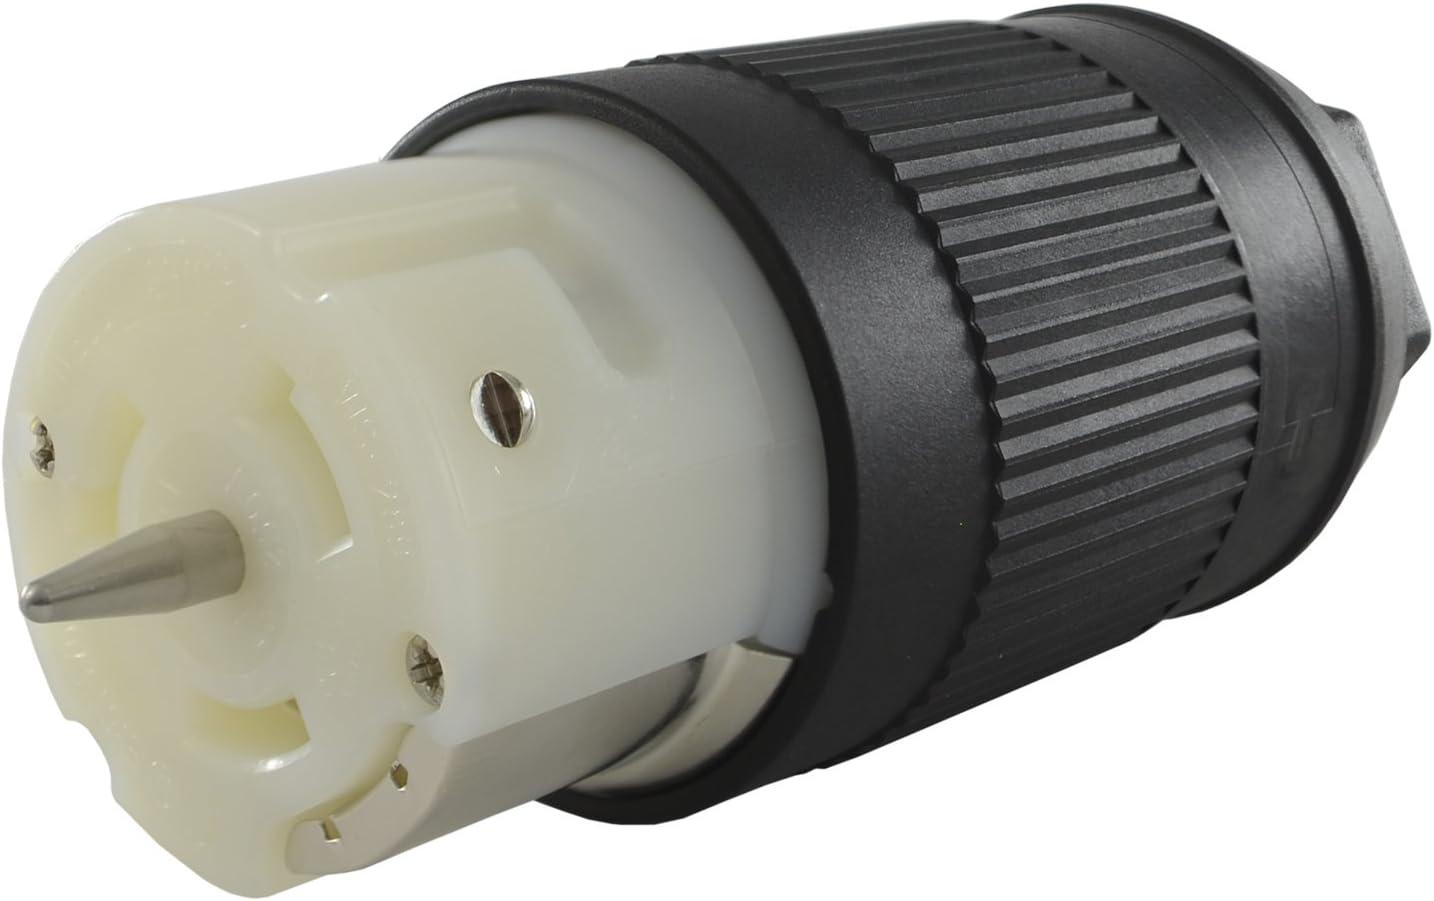 2-Pack CEP//Marinco CS6364N Female Plug 50-Amp 125//250V Twist Lock Connectors